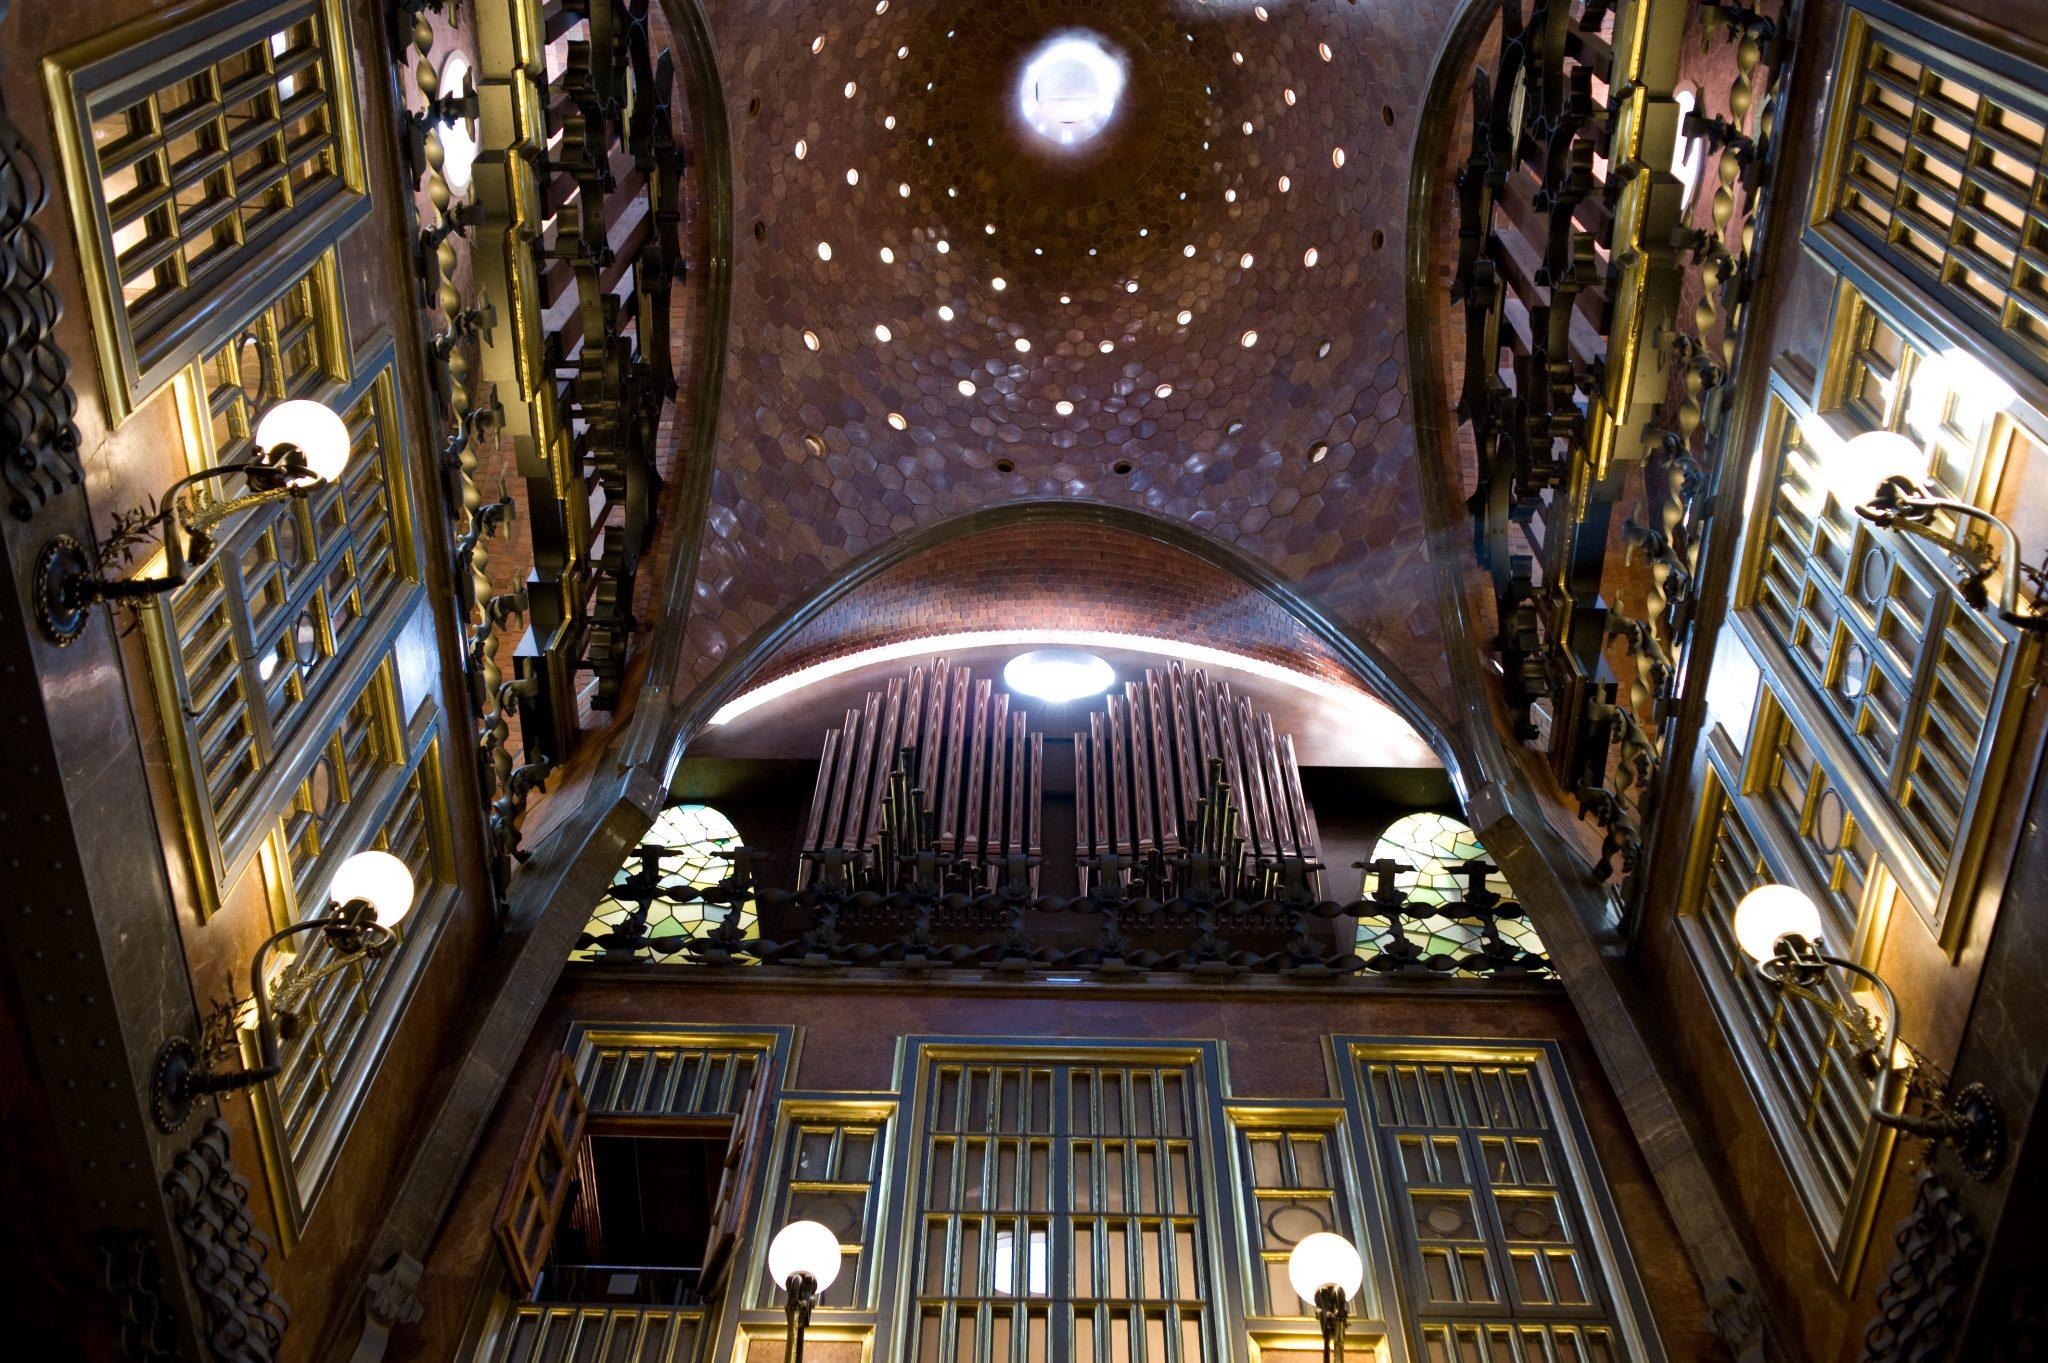 Ruta modernista por el casco viejo de barcelona - Casco antiguo de barcelona ...